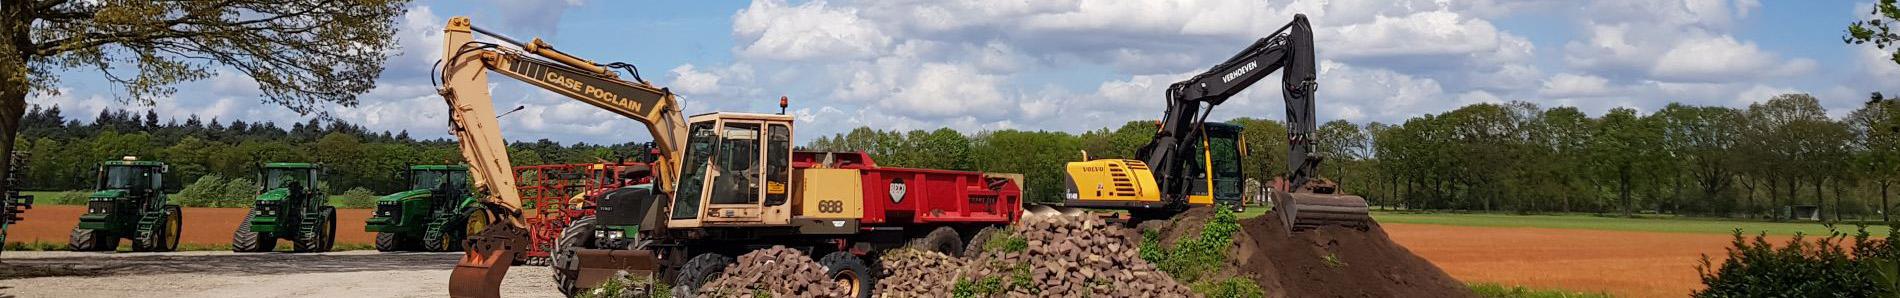 ABC Tractors Banner